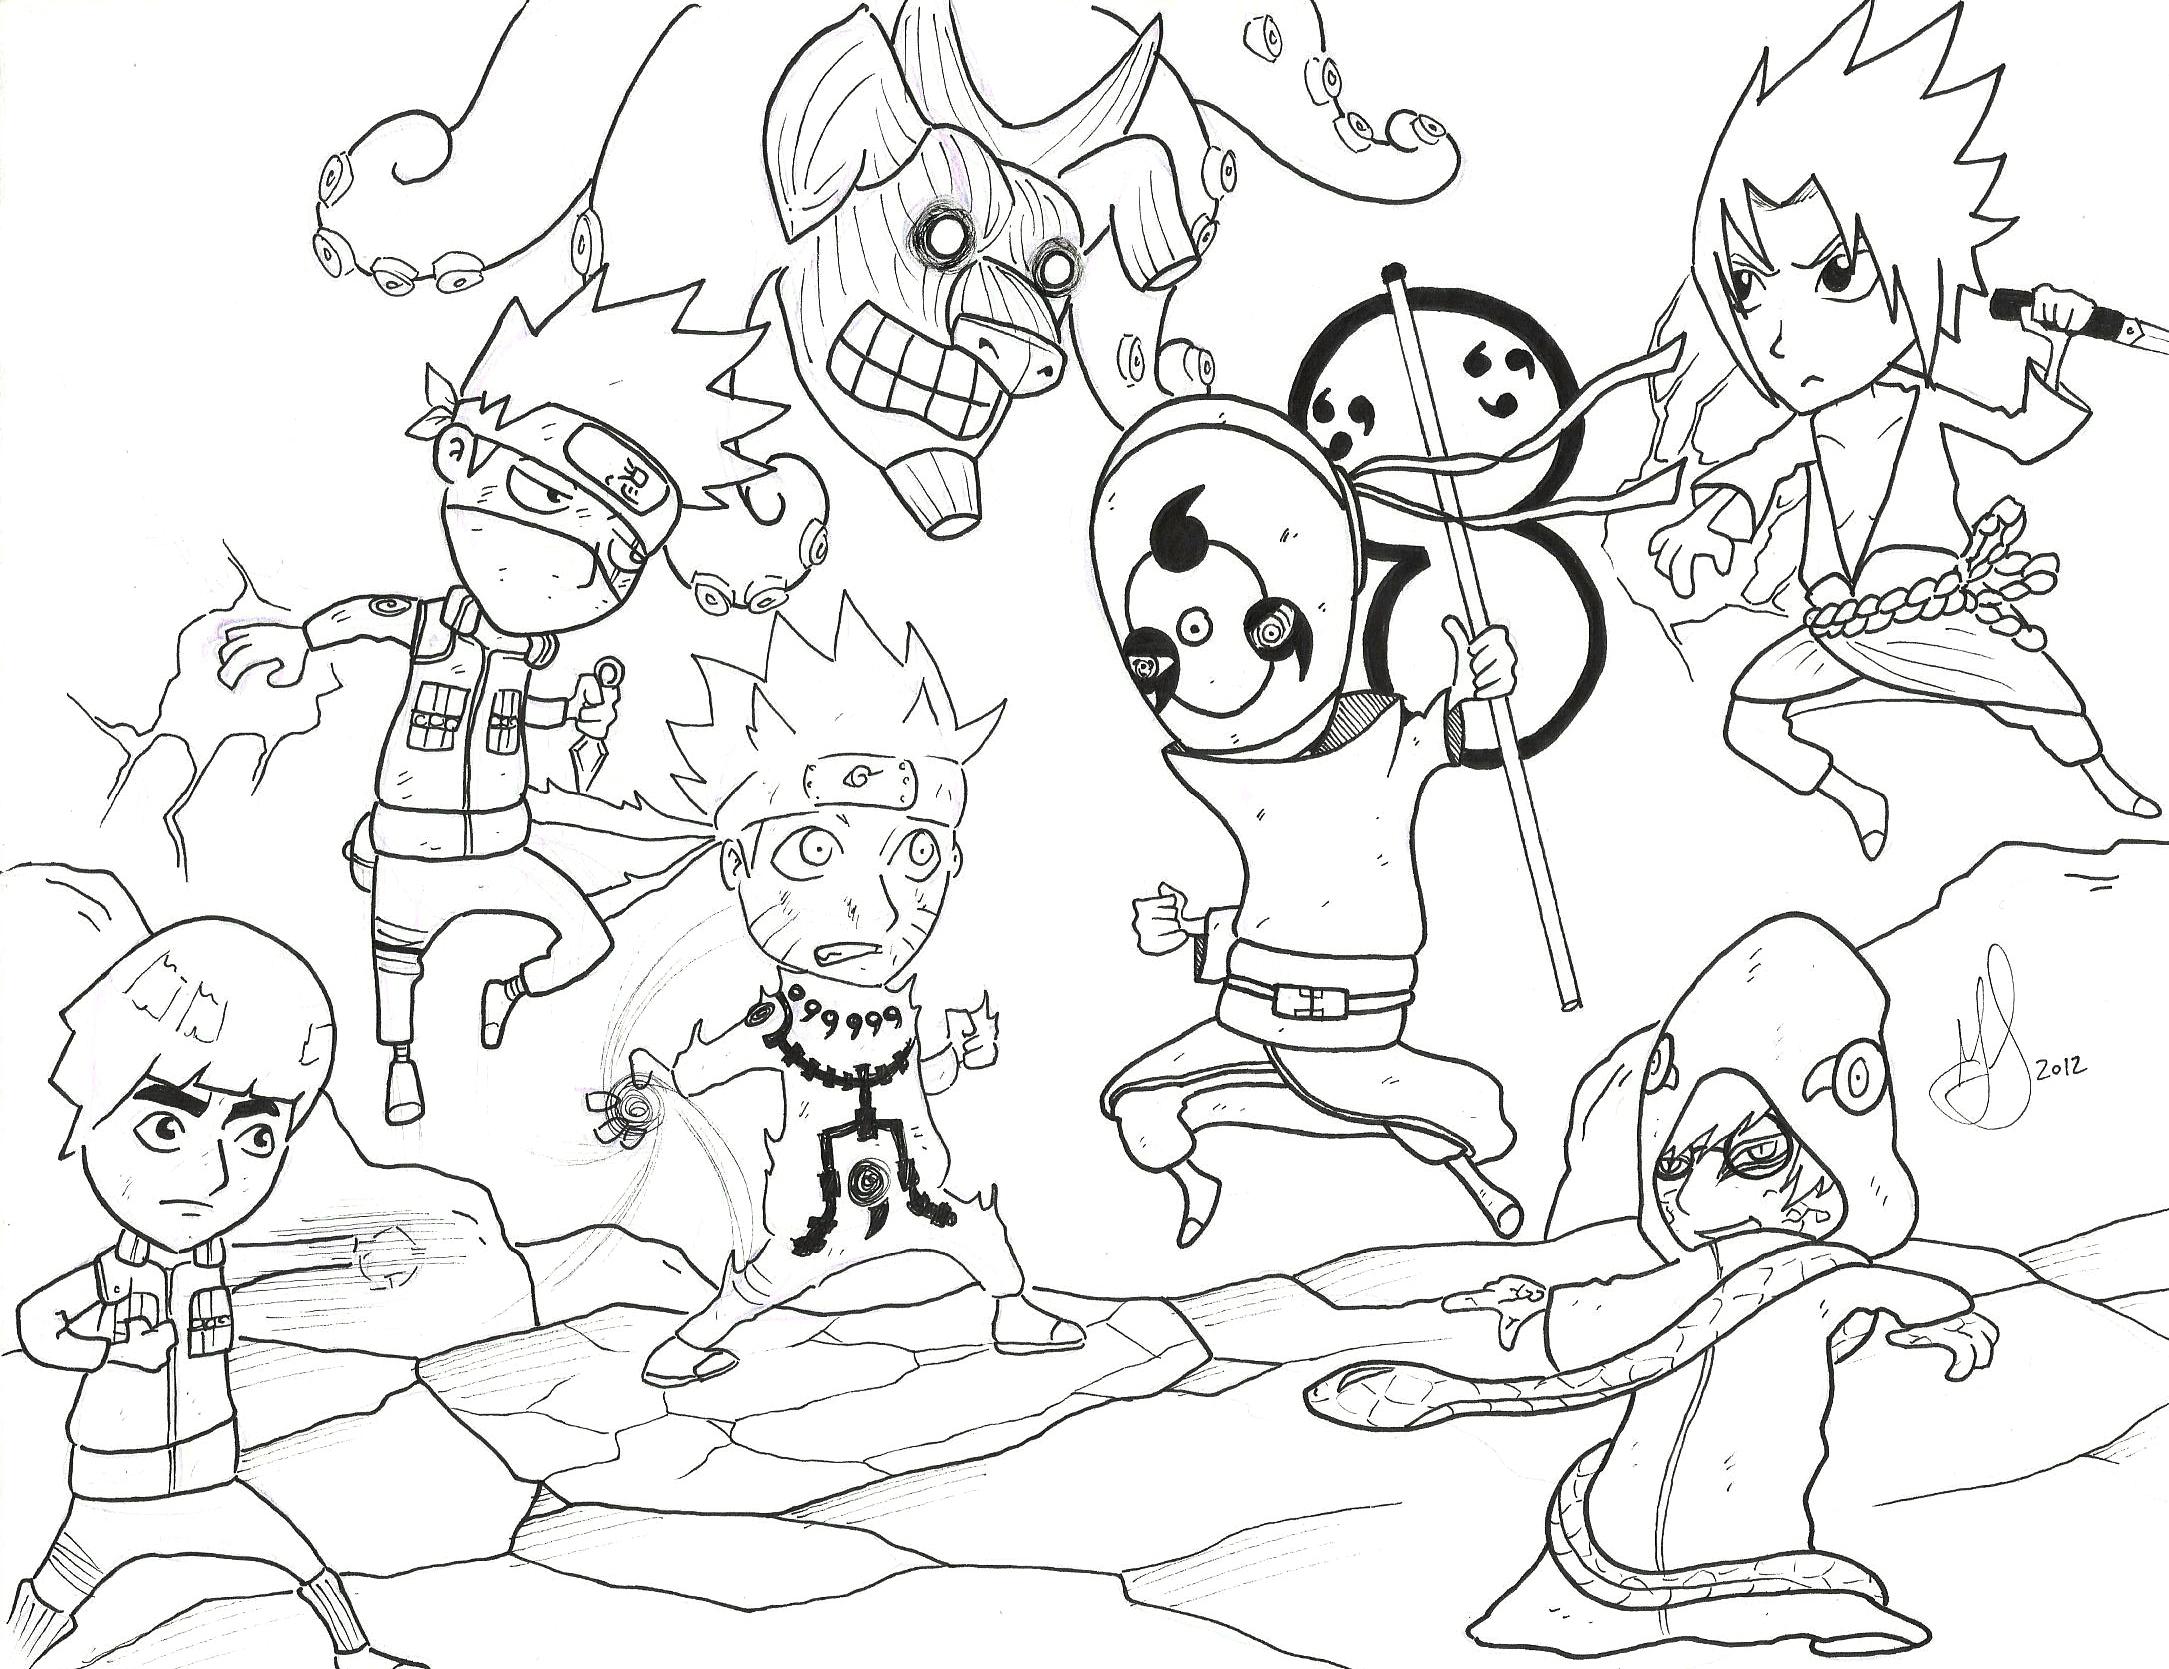 Naruto chibi war by gabcartoon on deviantart for Chibi naruto coloring pages